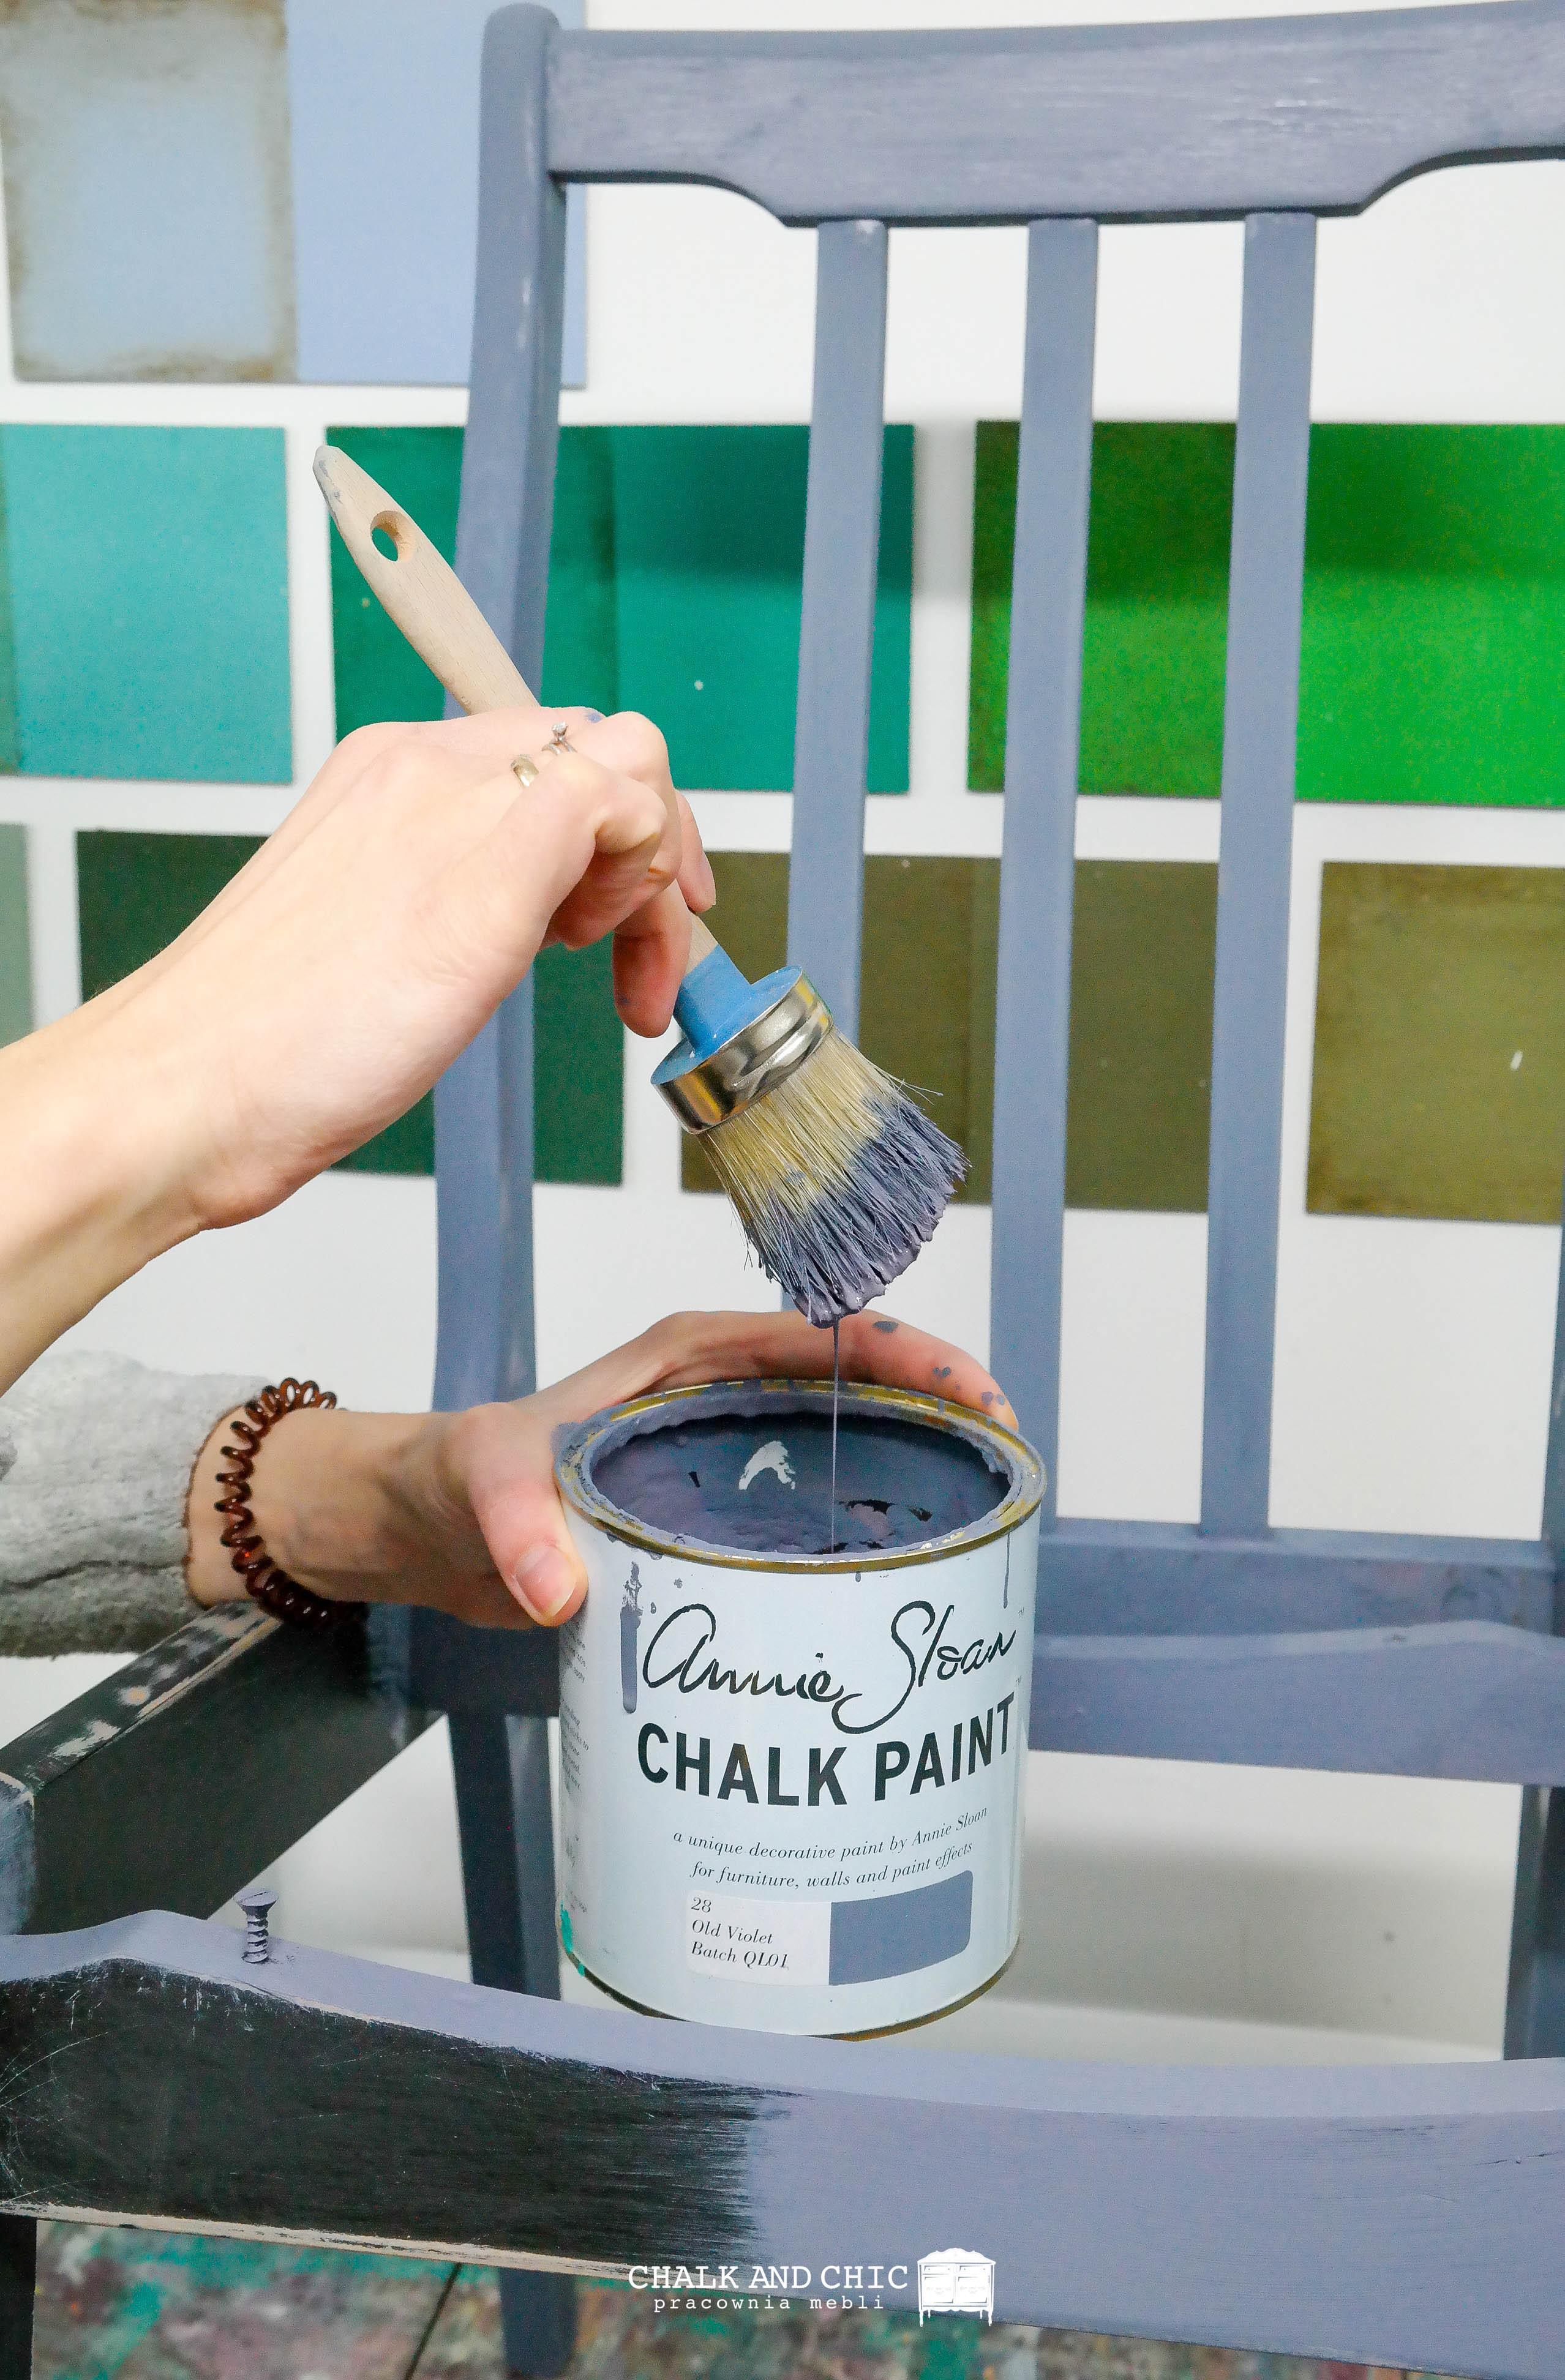 Chalk Paint Annie Sloan odnawianie mebli Lublin